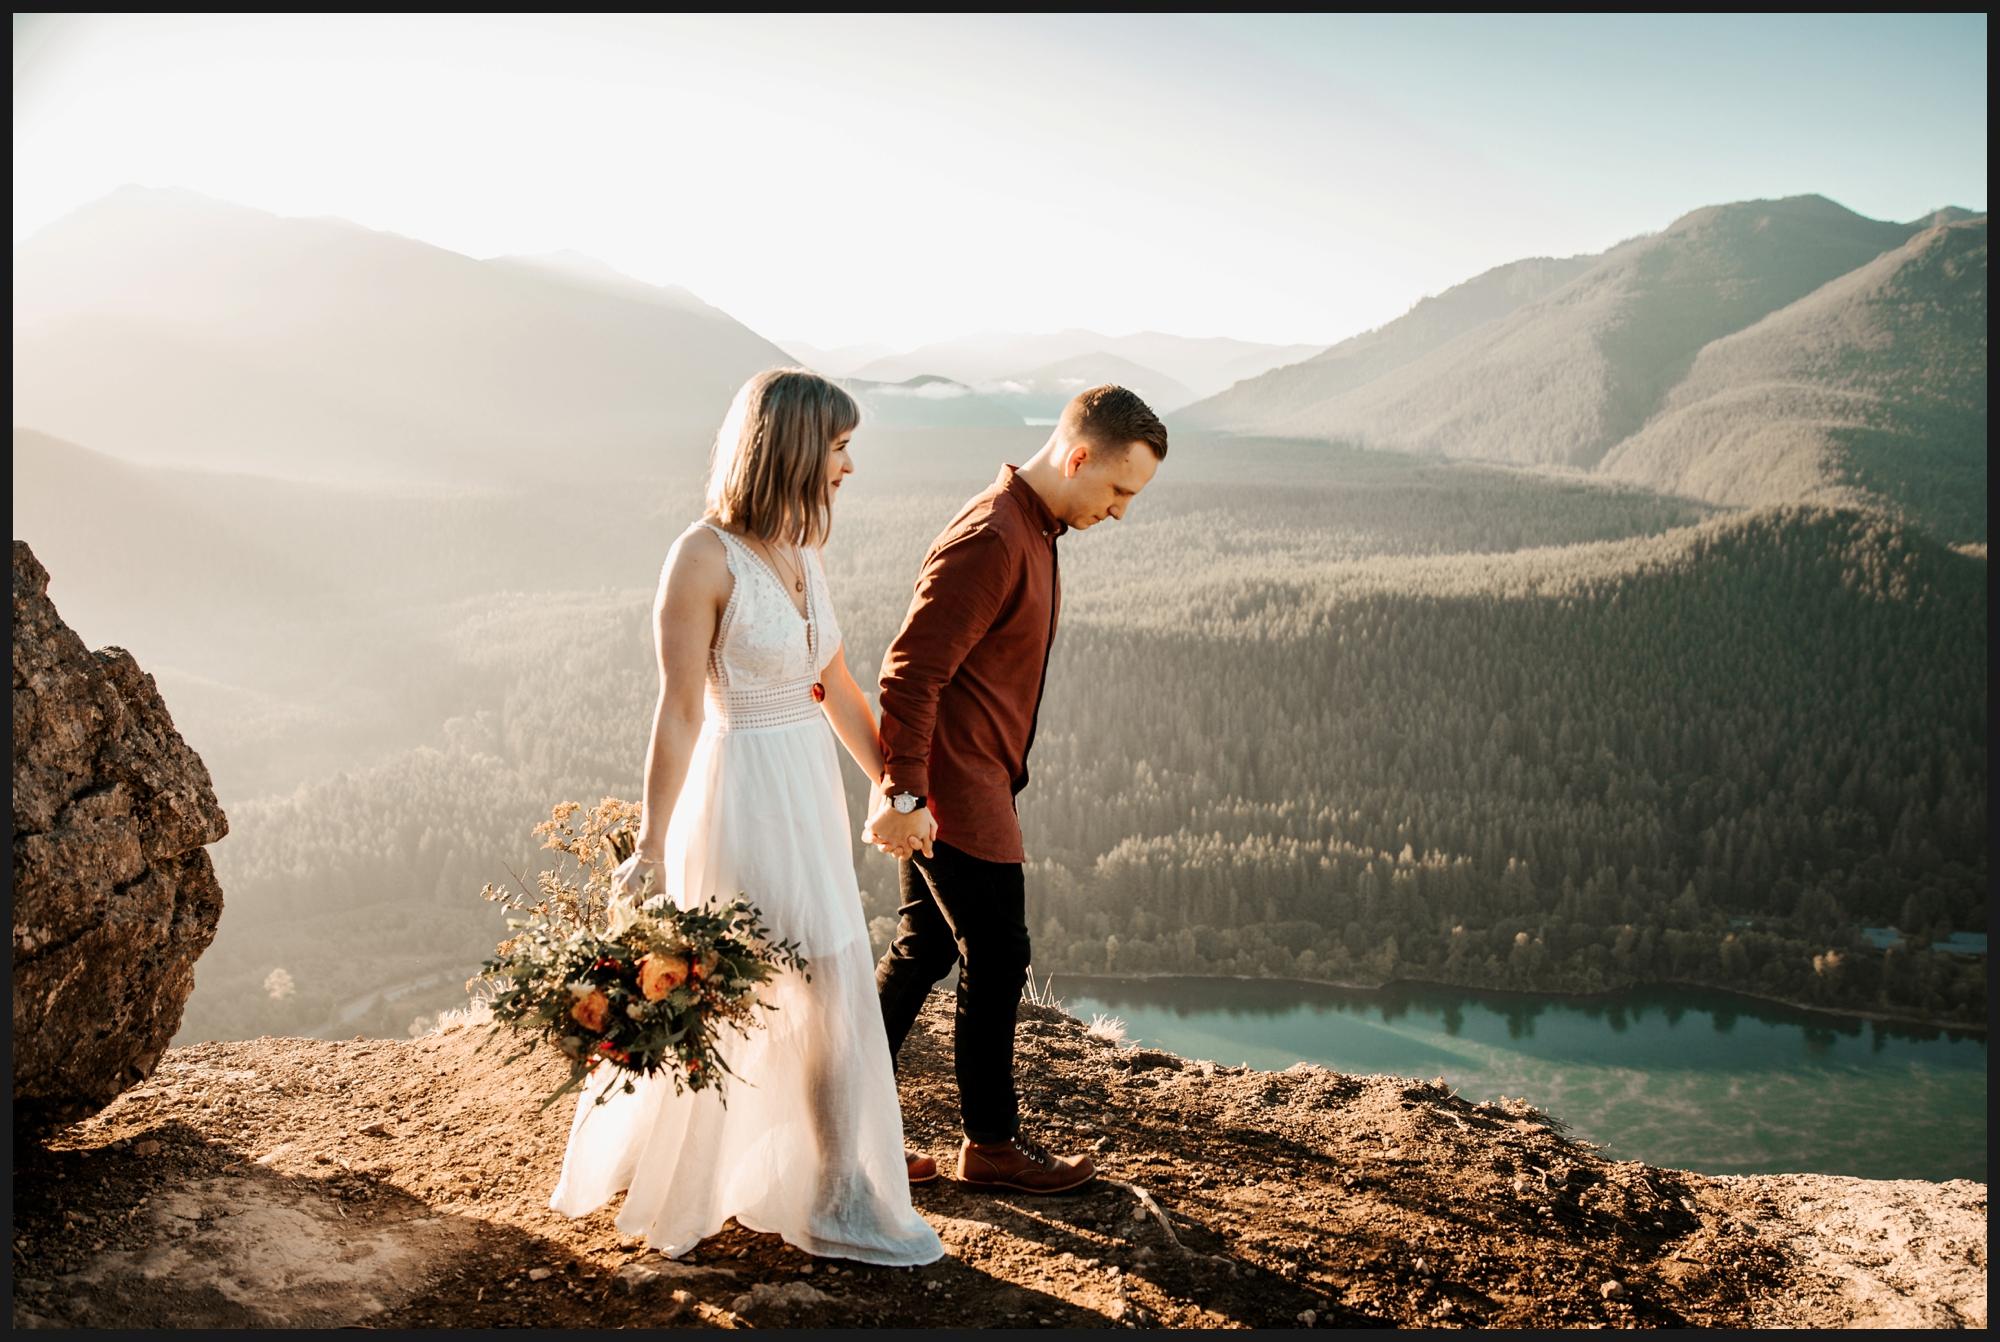 Orlando-Wedding-Photographer-destination-wedding-photographer-florida-wedding-photographer-bohemian-wedding-photographer_0442.jpg